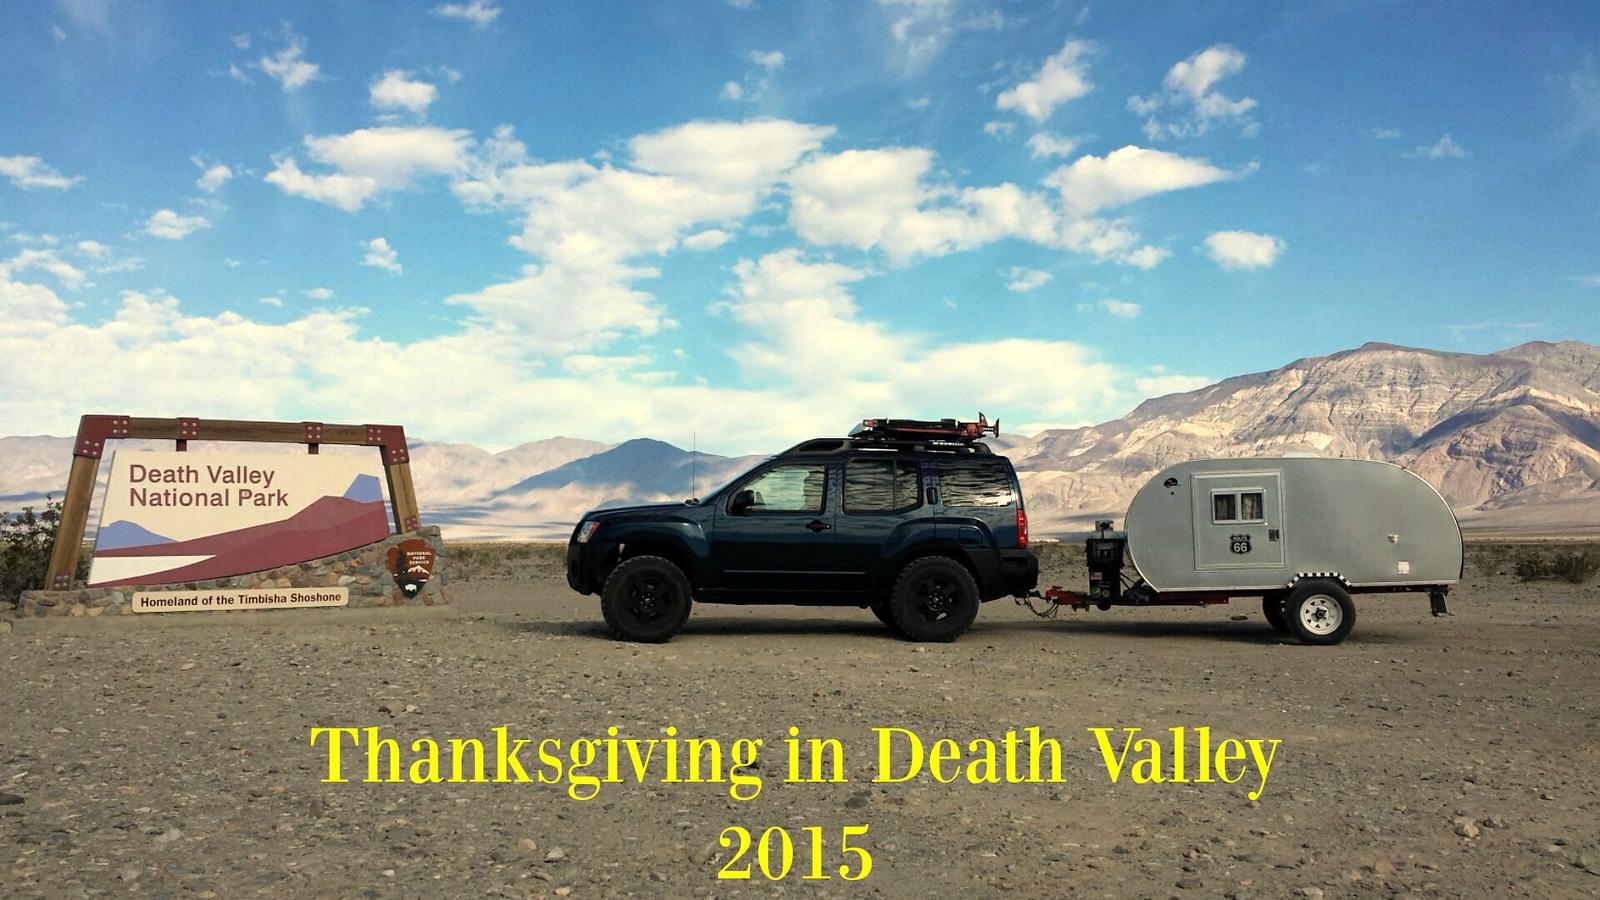 https://williamacarr.smugmug.com/Road-Trips/Thanksgiving-2015/i-Gk5CvjS/0/X3/1-X3.jpg